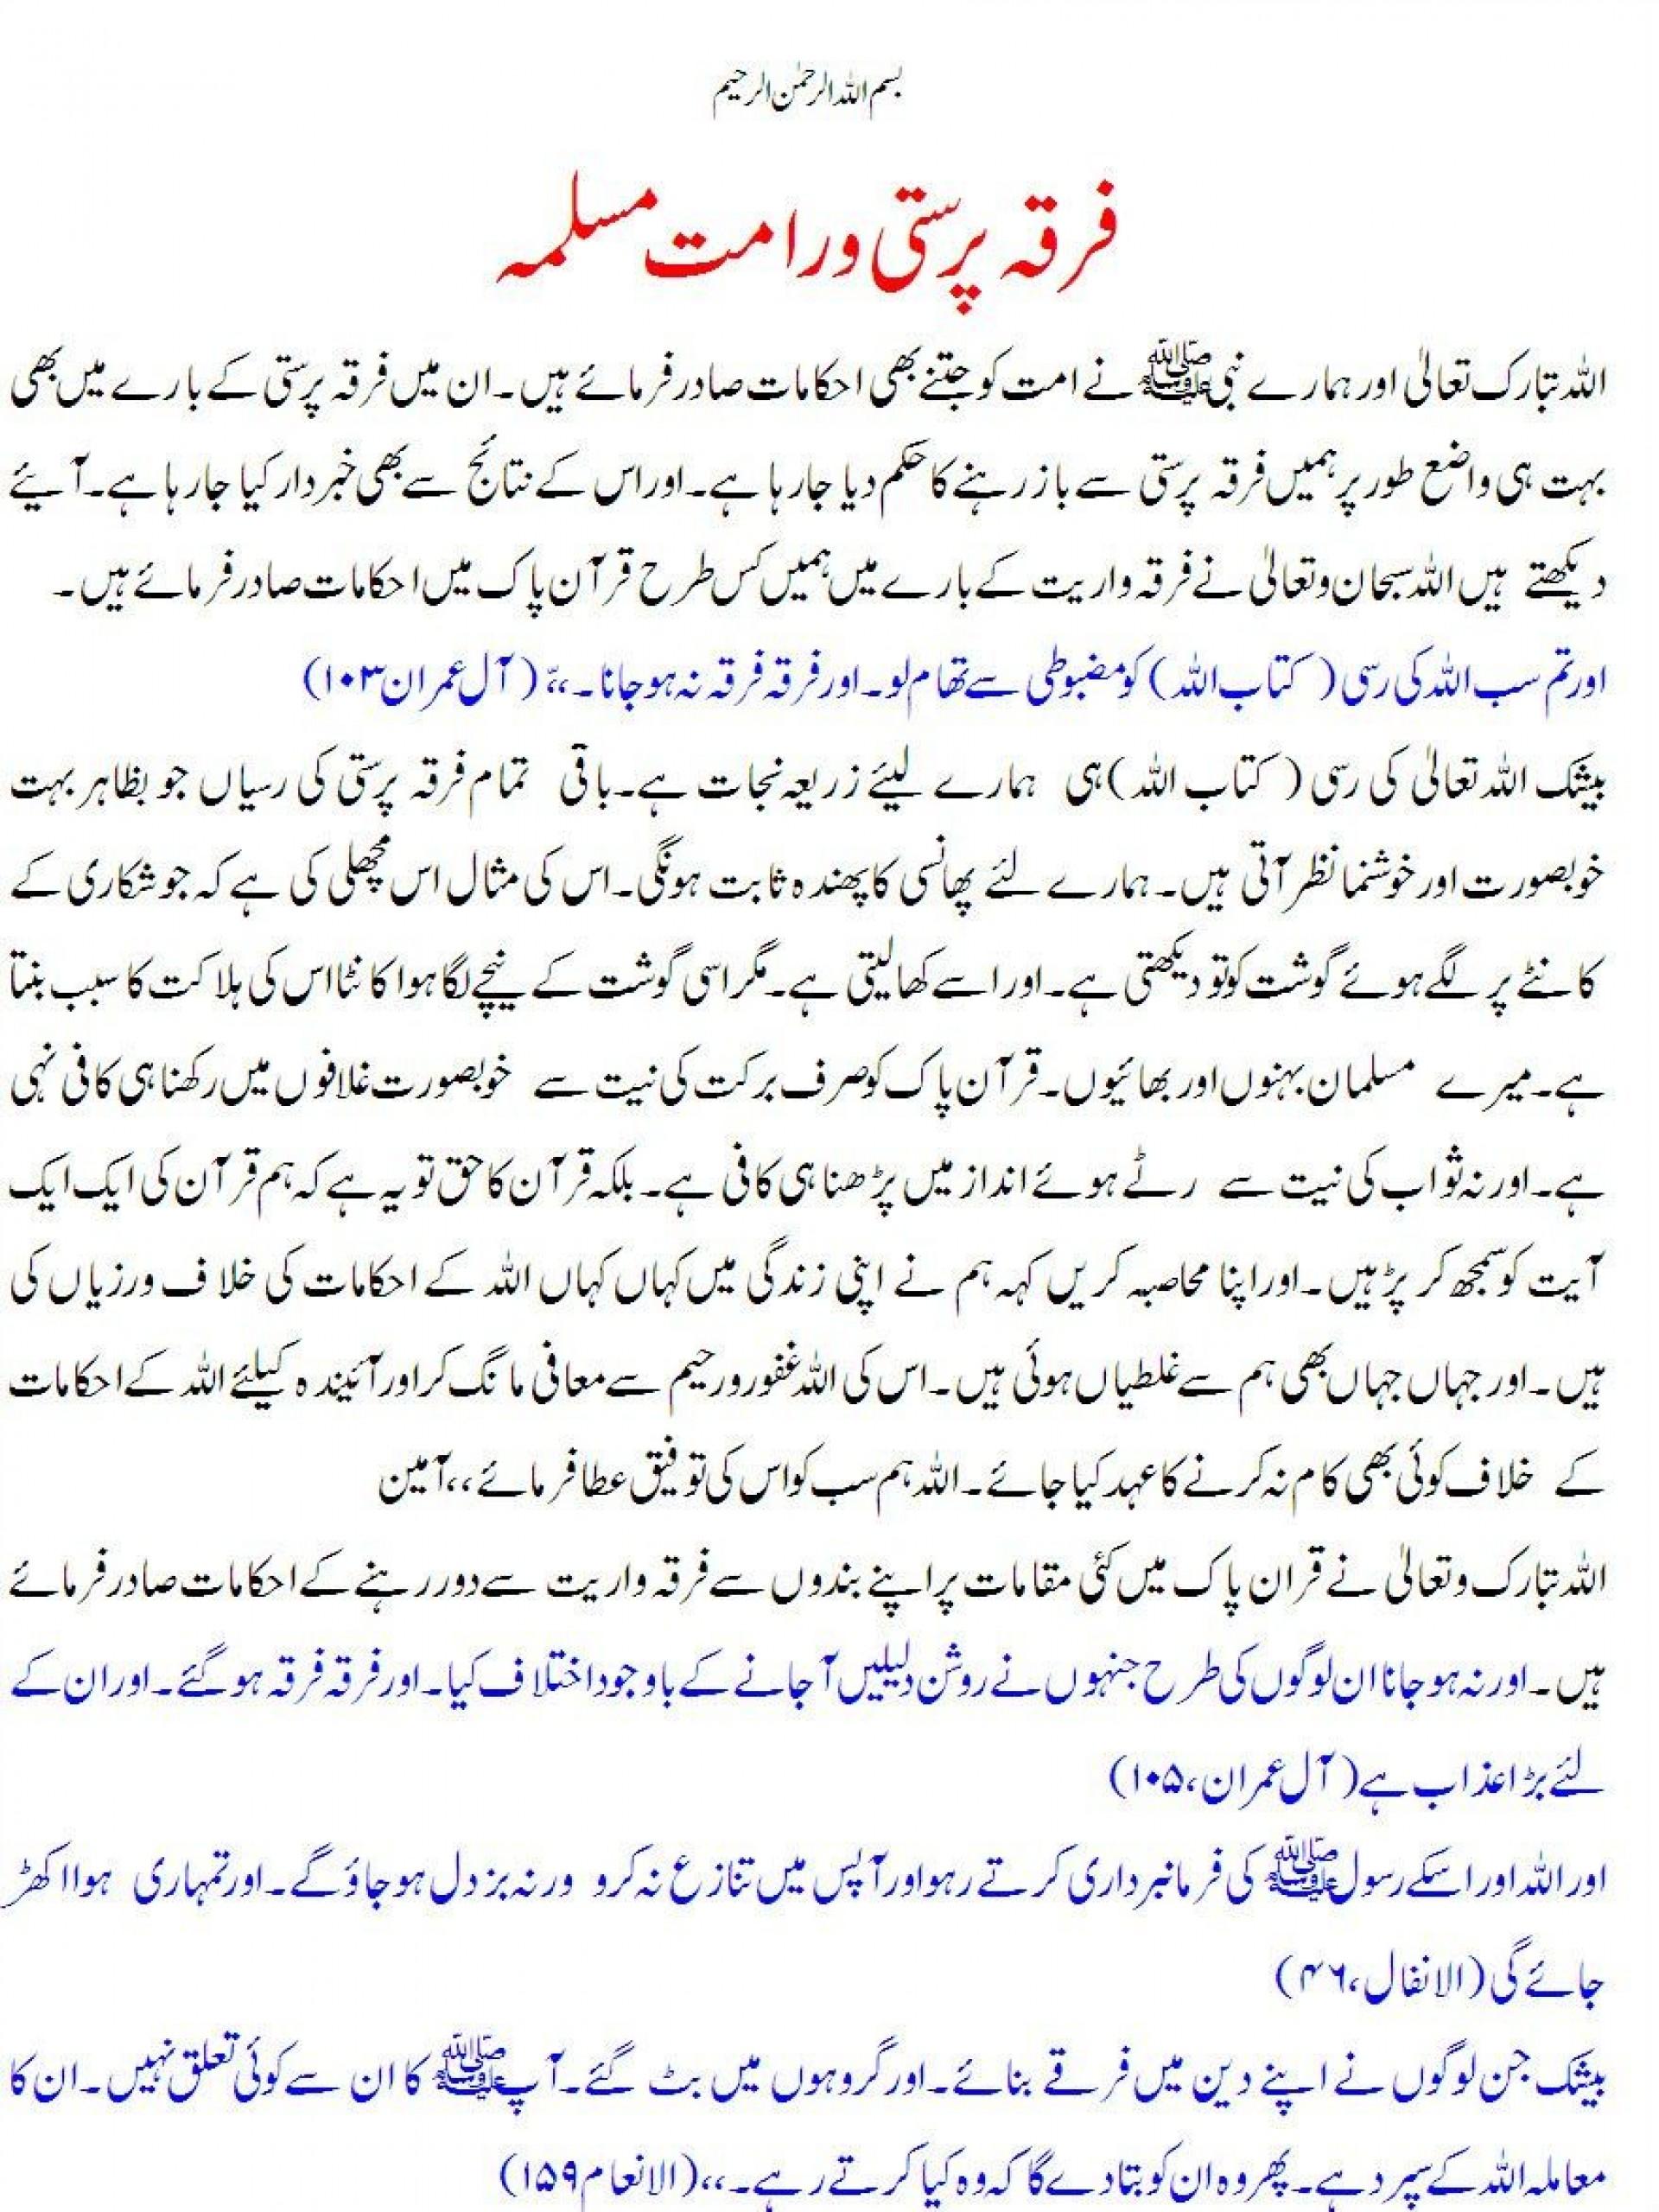 015 Essay On Islam Awful Persuasive Islamophobia My City Islamabad In Urdu Religion Hindi 1920